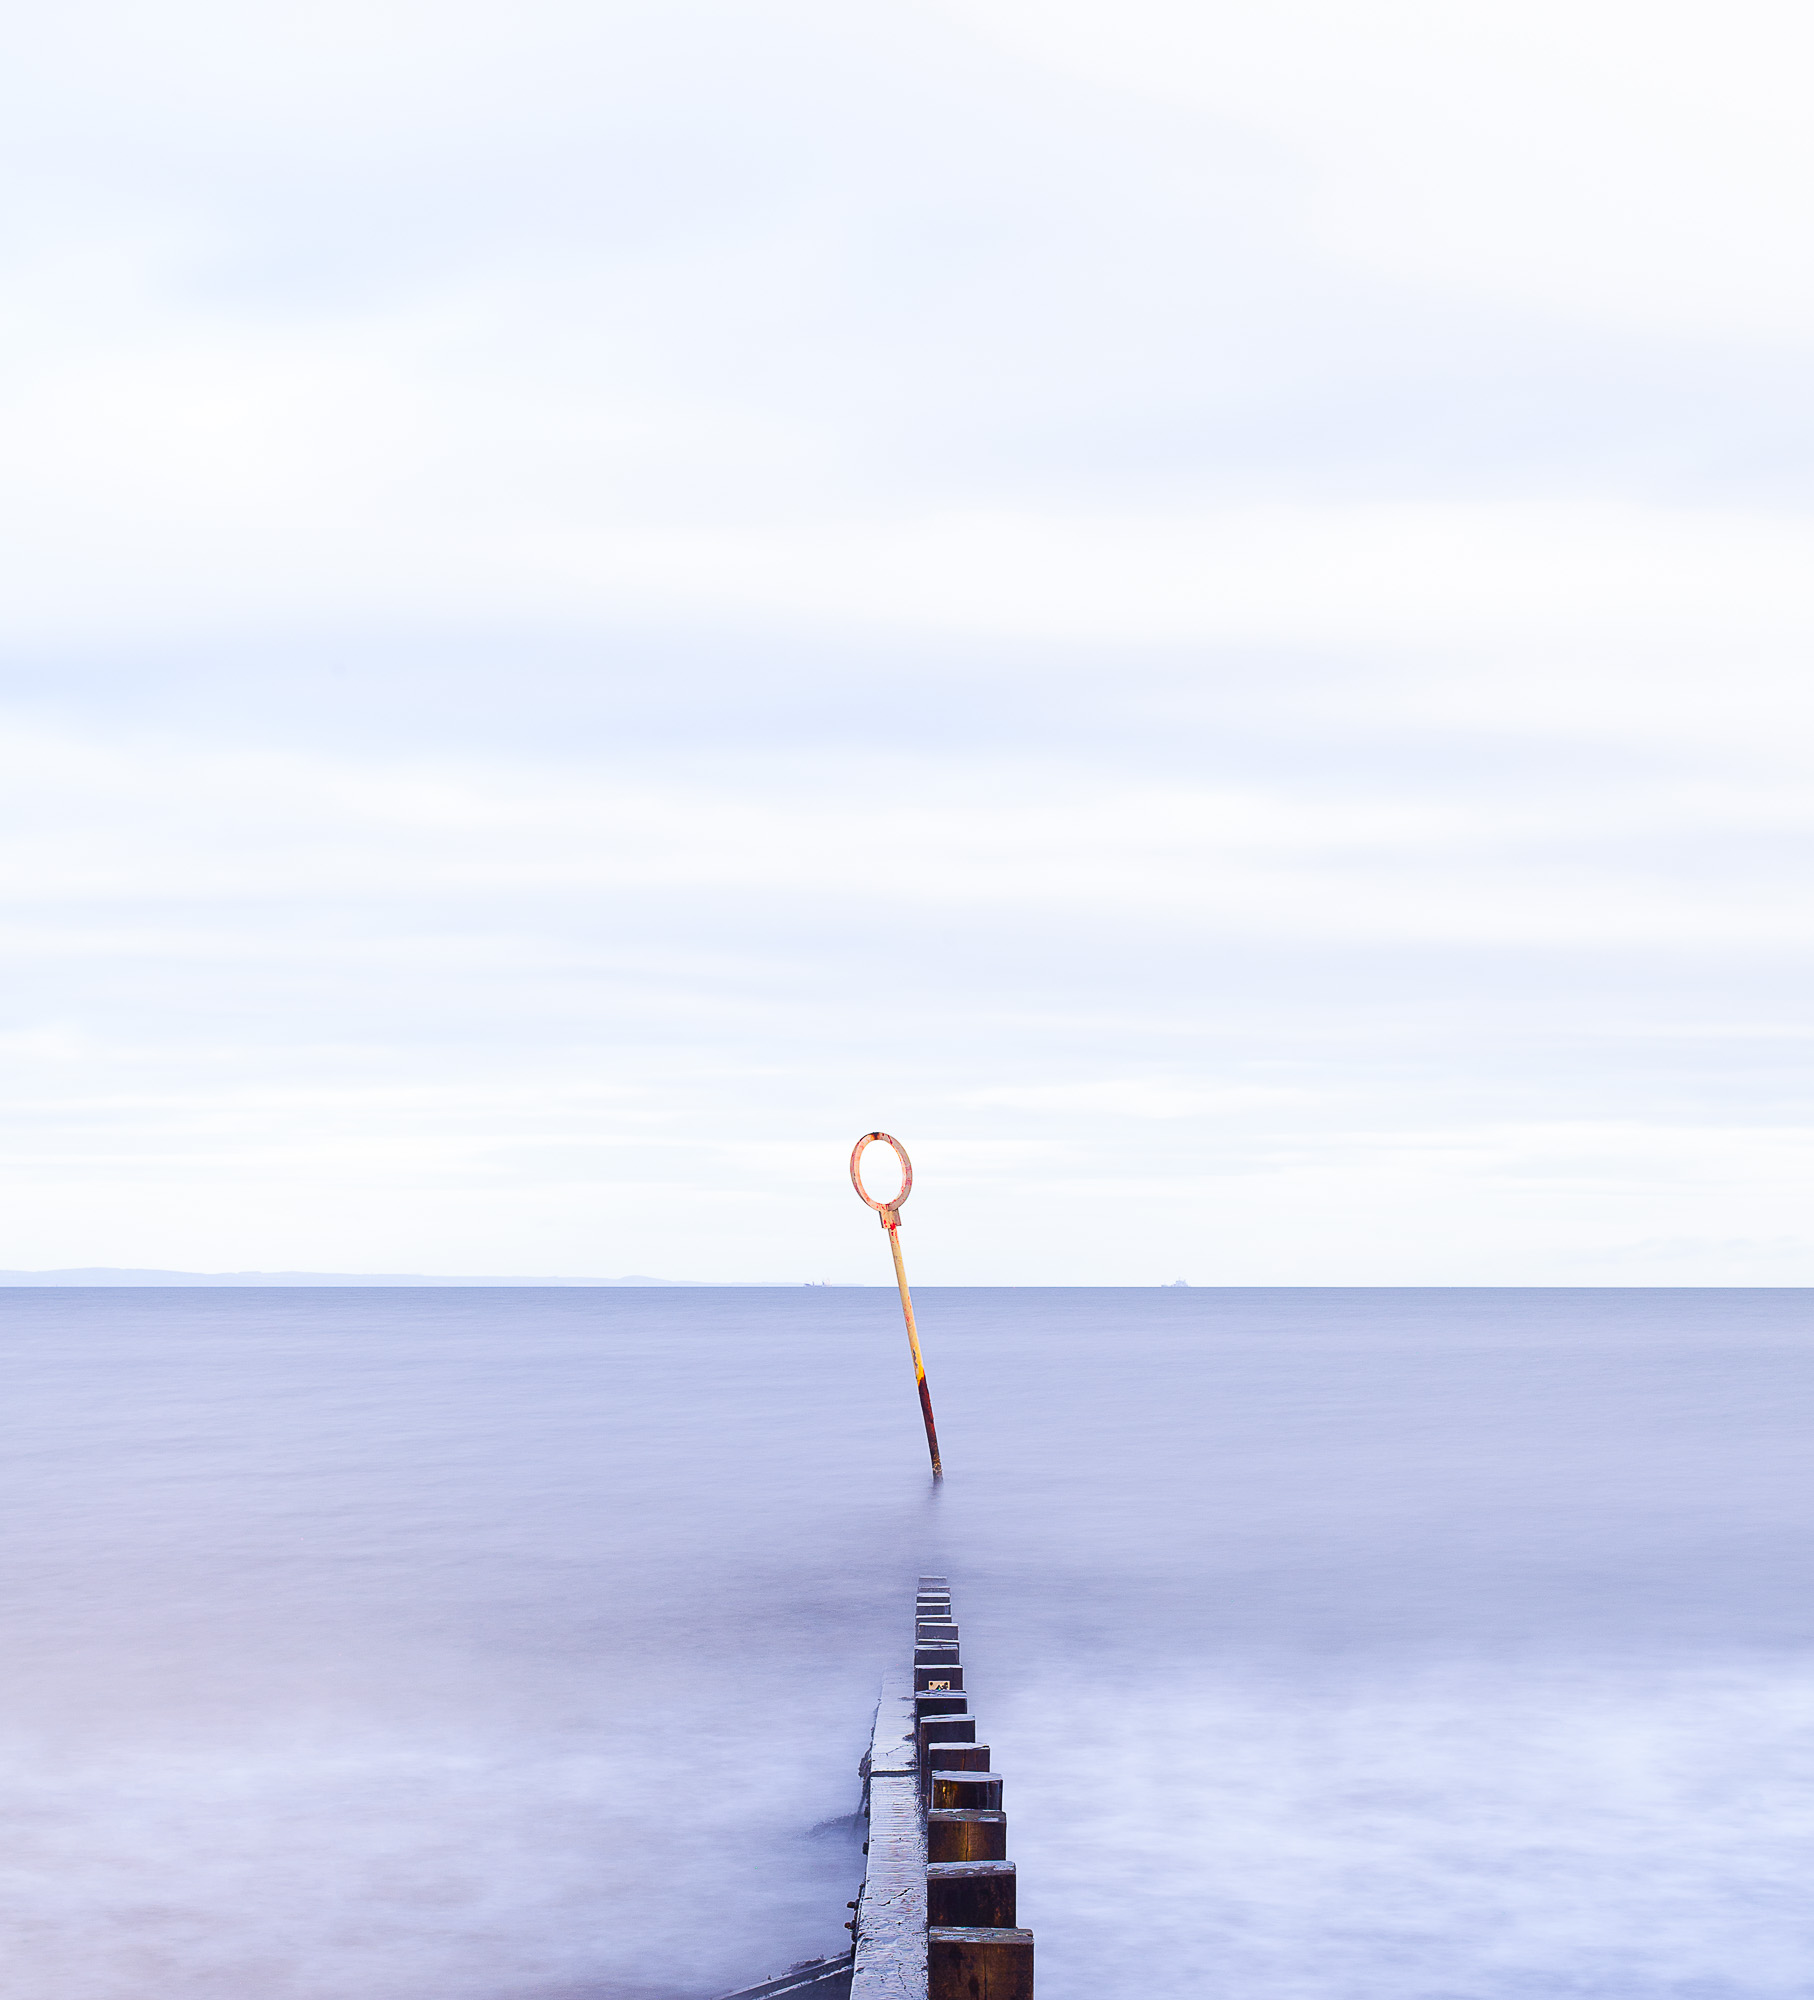 201812_Portobello_Stuart McMillan Photography_017-Edit.jpg